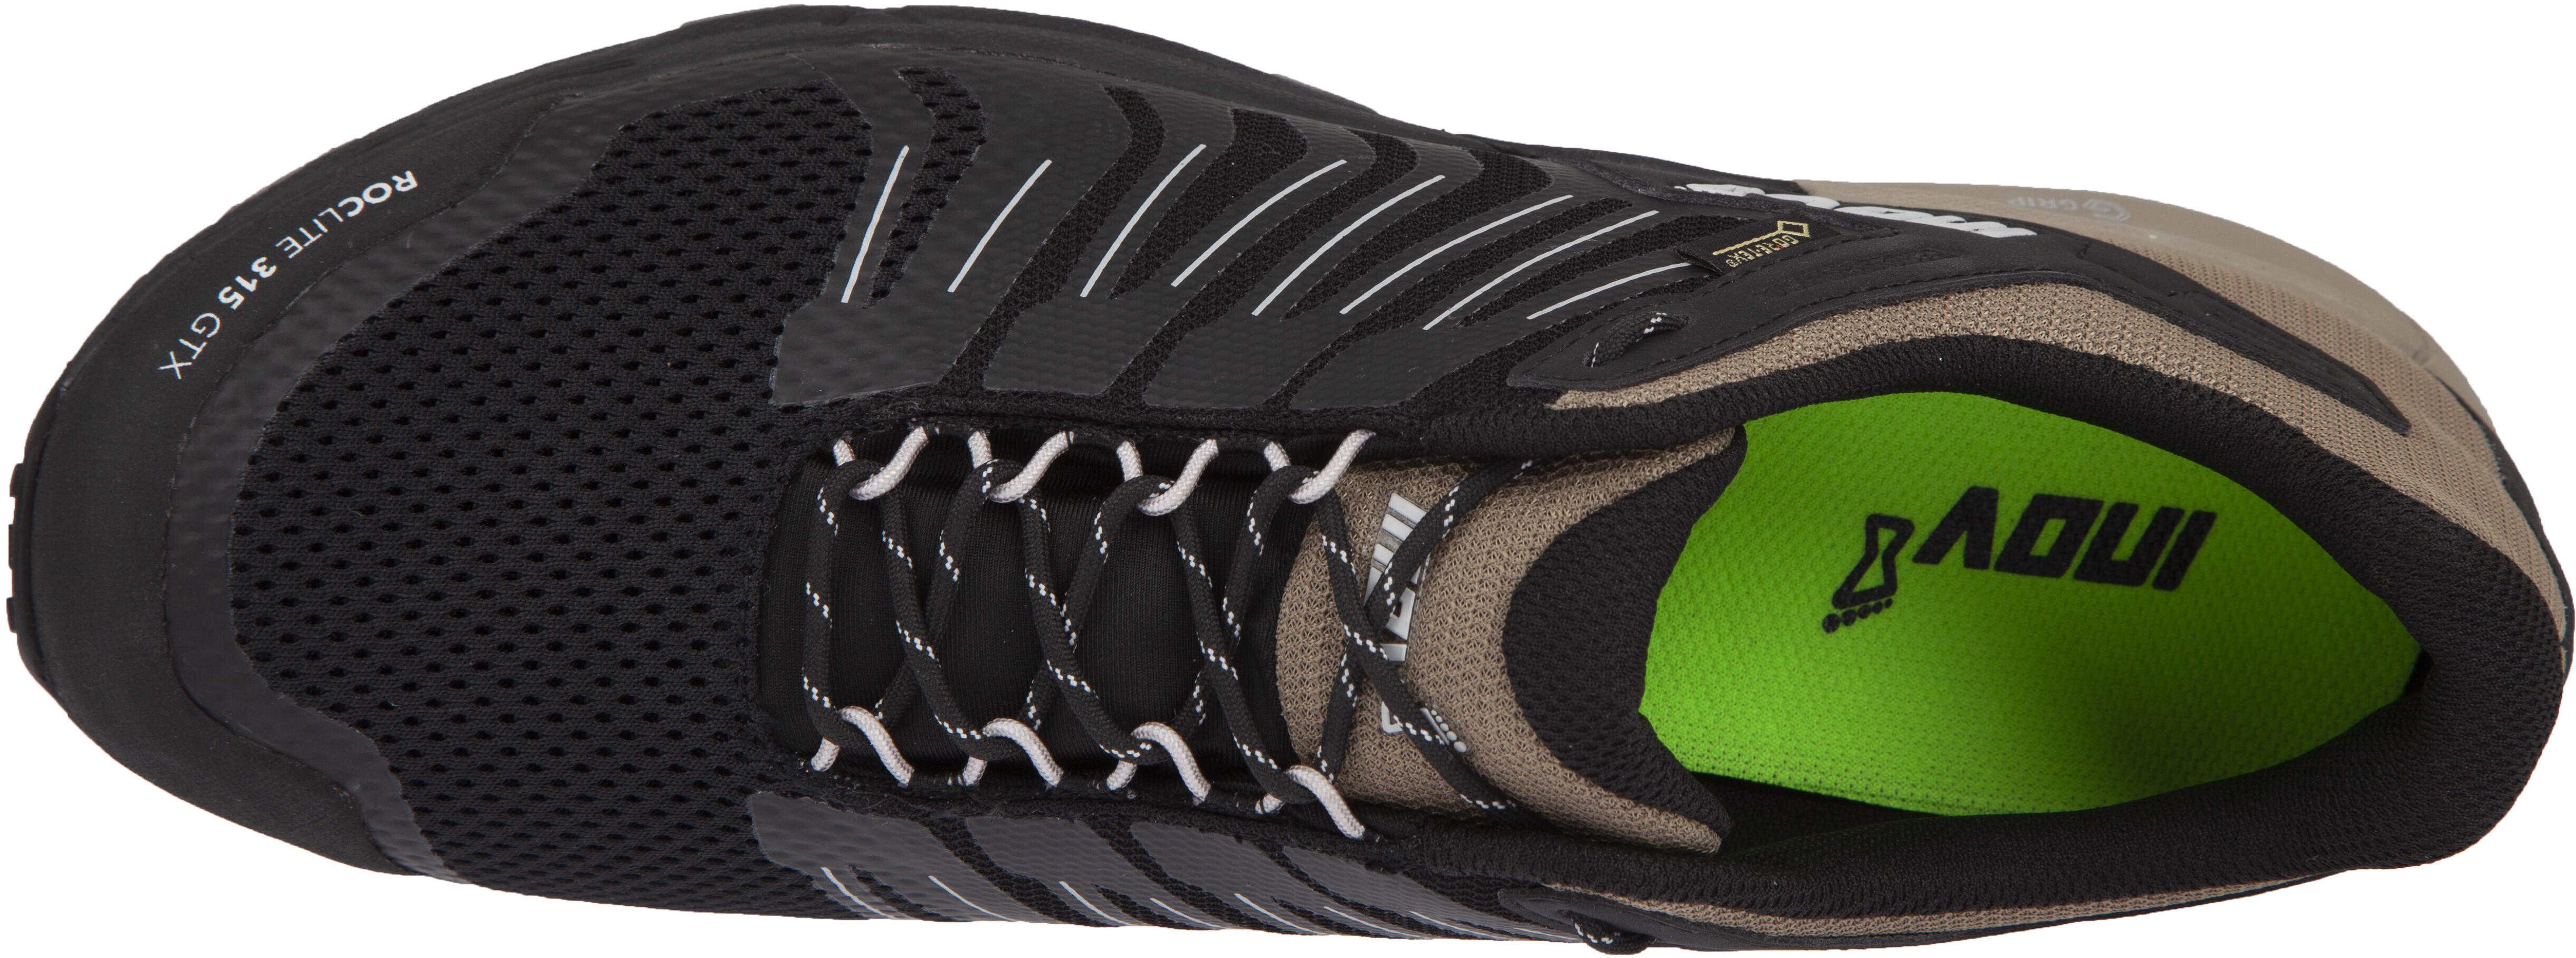 sale retailer f35a9 48635 inov-8 Roclite 315 GTX Shoes Men black/brown